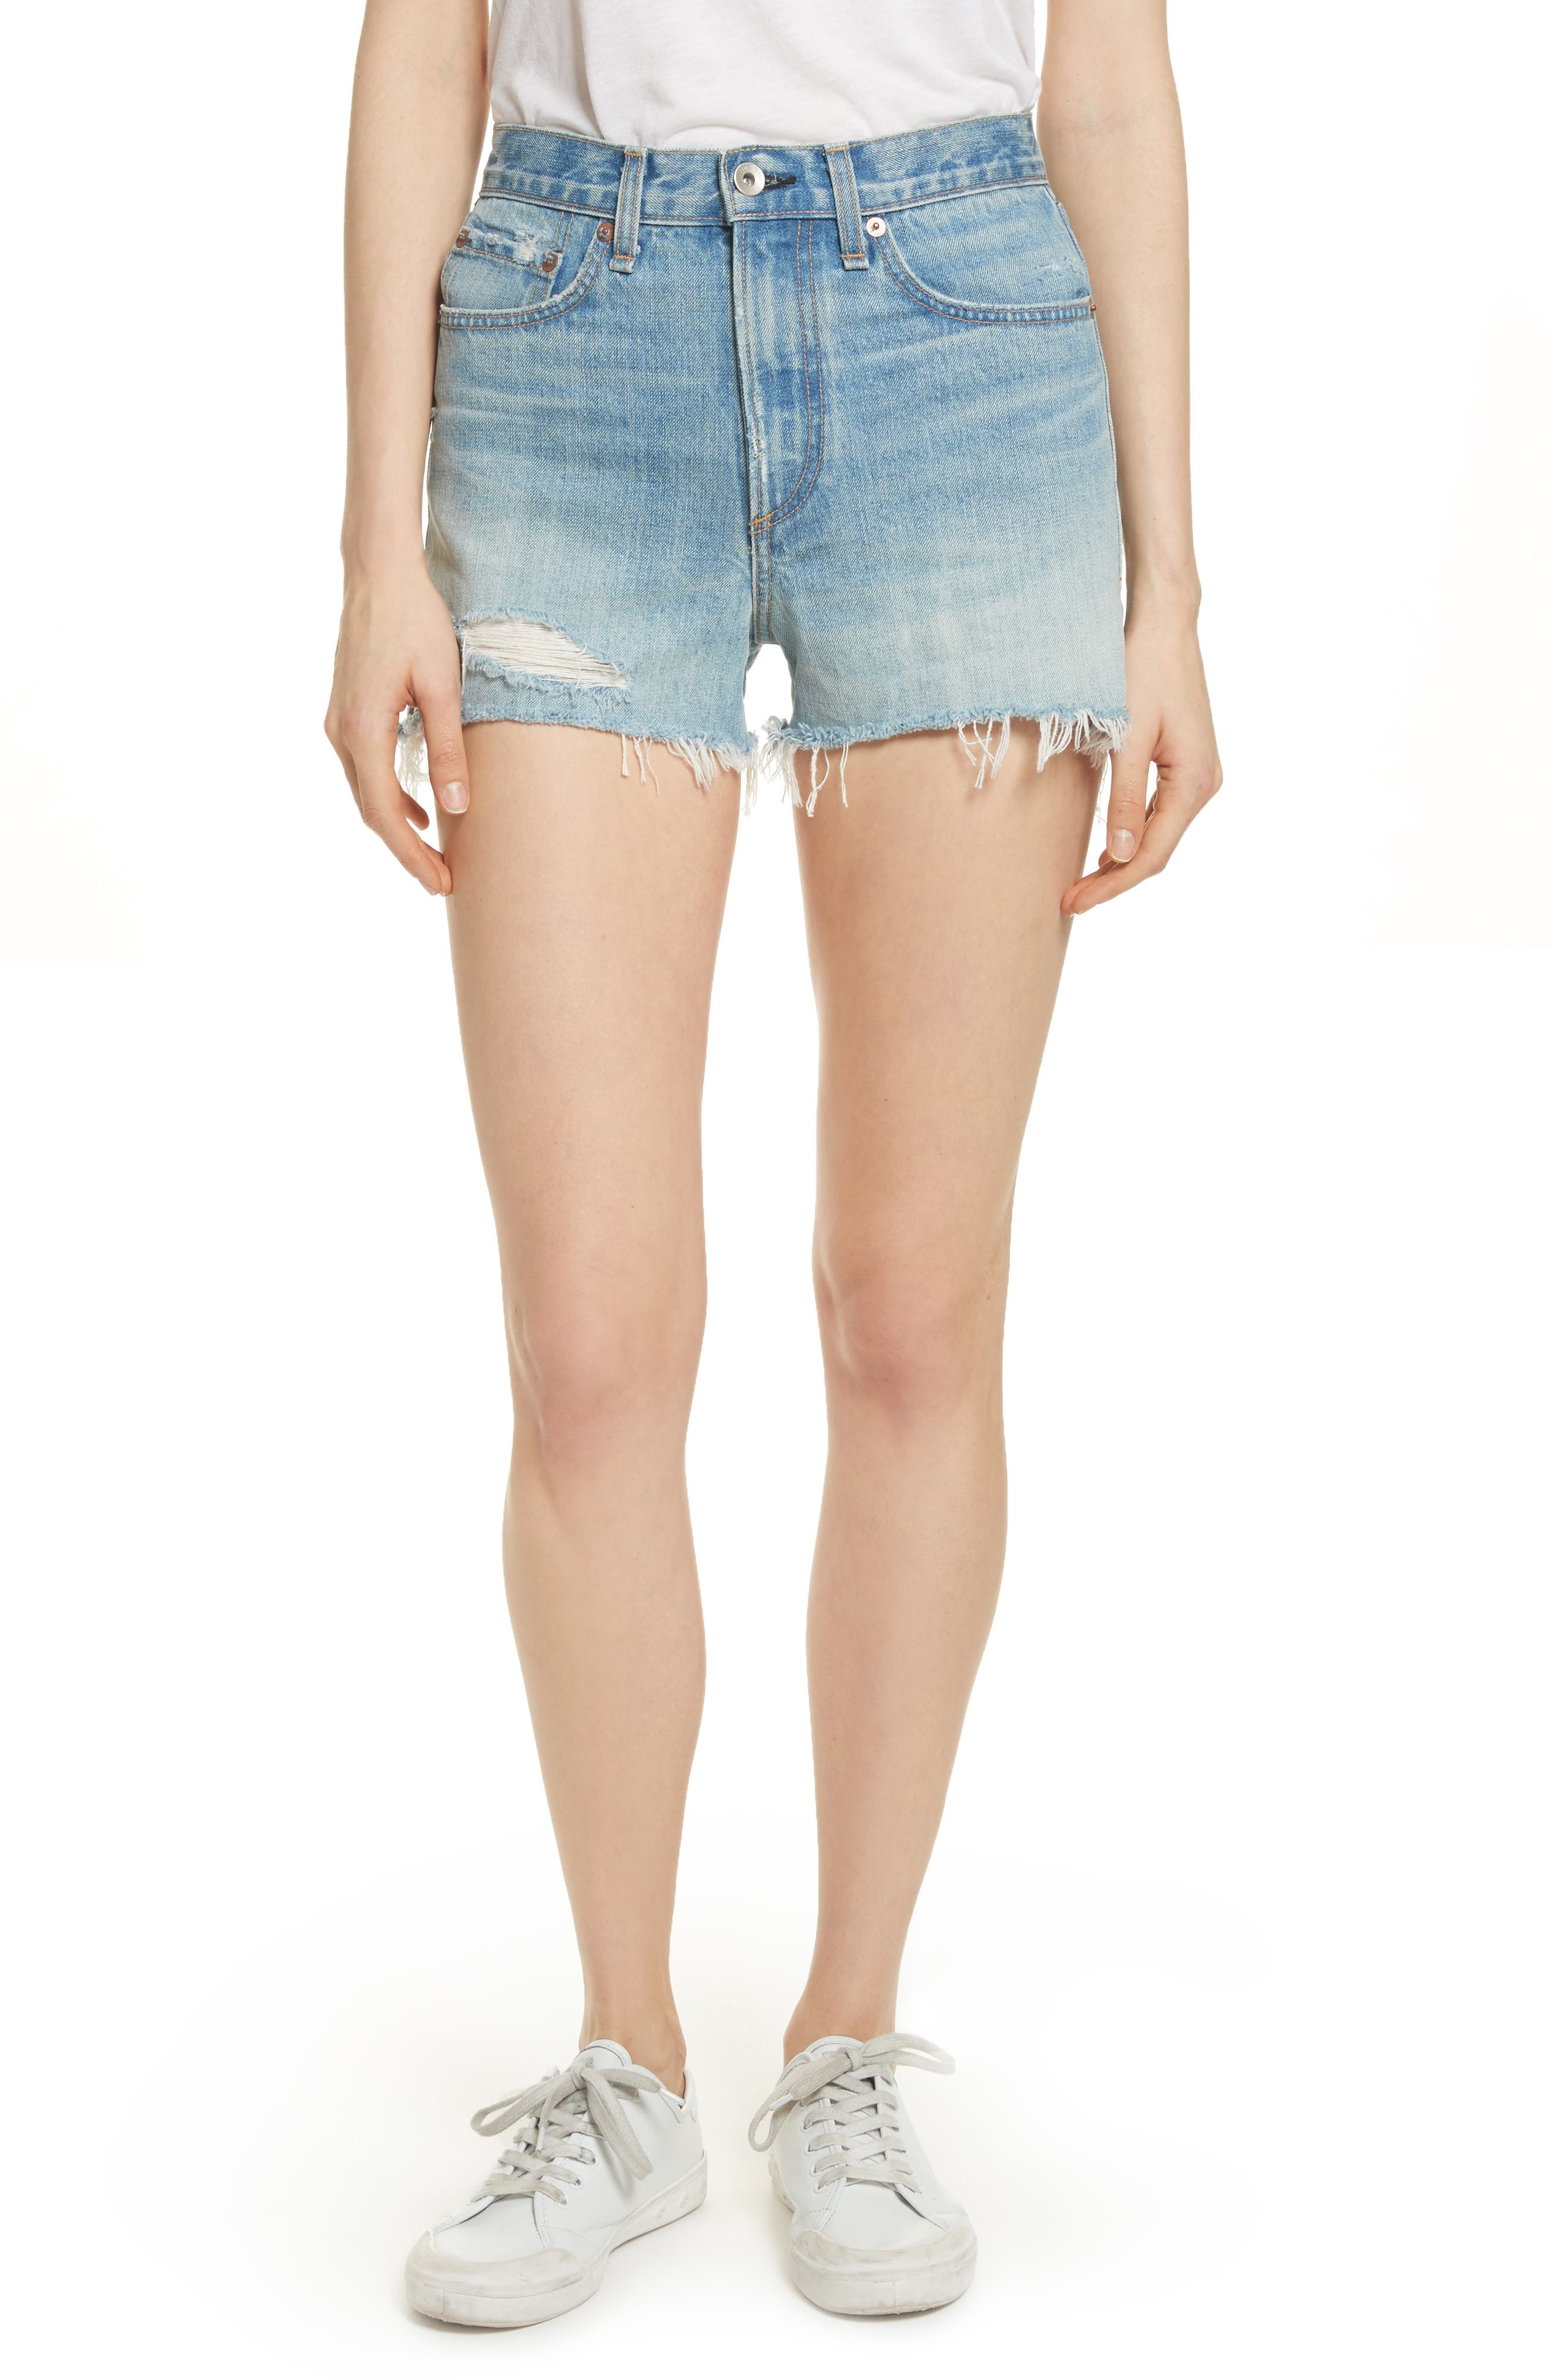 Alternate Image 1 Selected - rag & bone/JEAN Justine High Waist Cutoff Denim Shorts (Duffs)